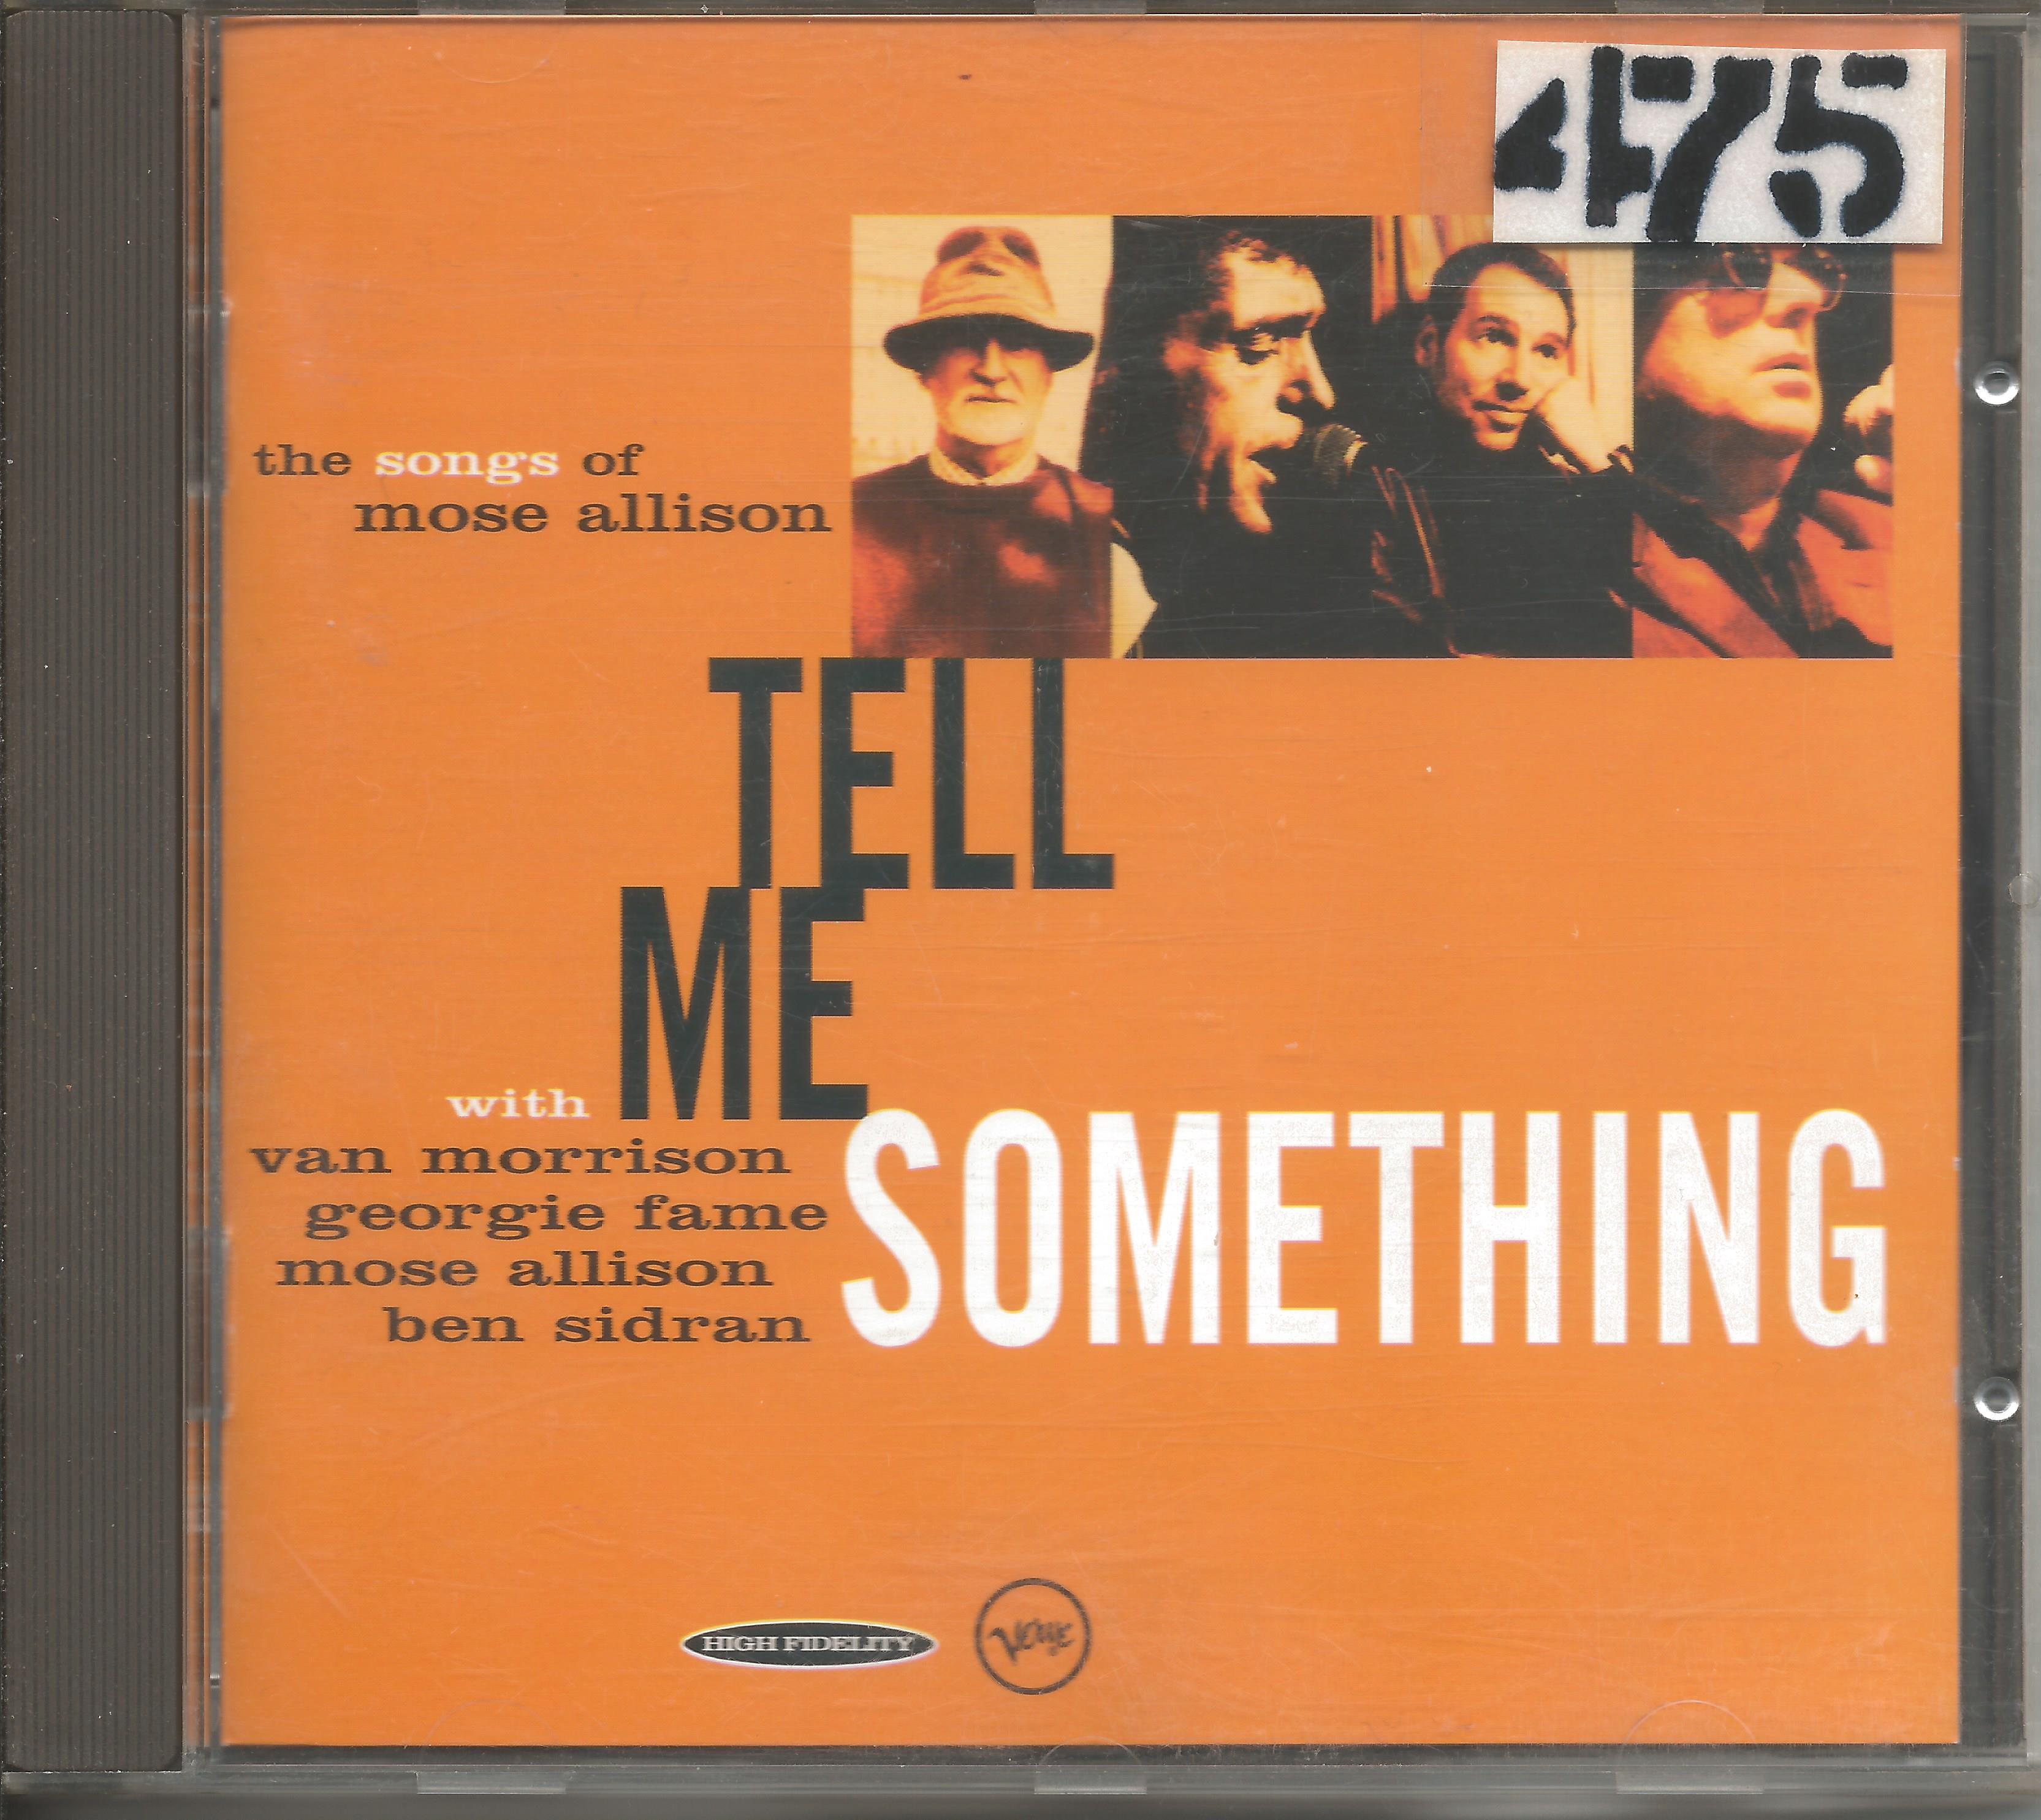 Van Morrison, Georgie Fame, Mose Allison, Ben Sidran – Tell Me Something (The Songs Of Mose Allison1996CD